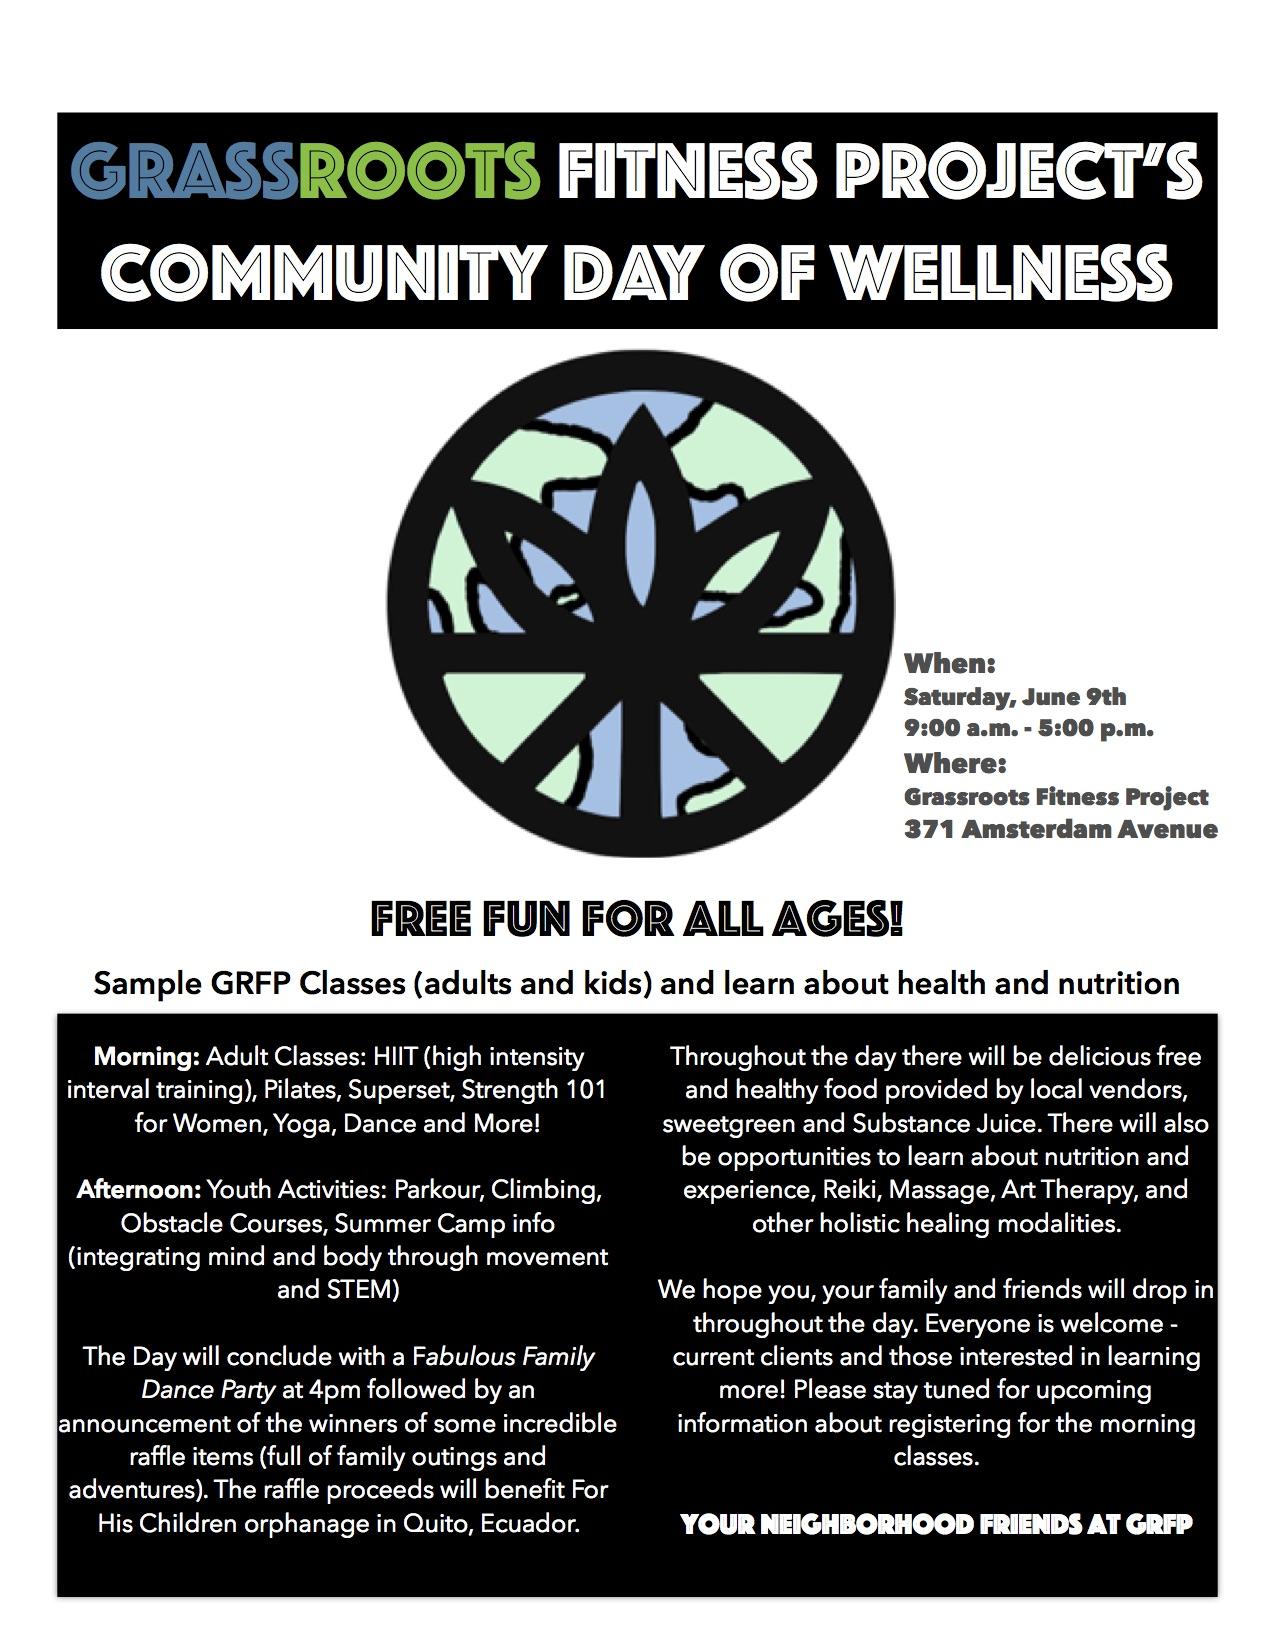 GRFP Community Wellness Day 2018-Flier.jpg